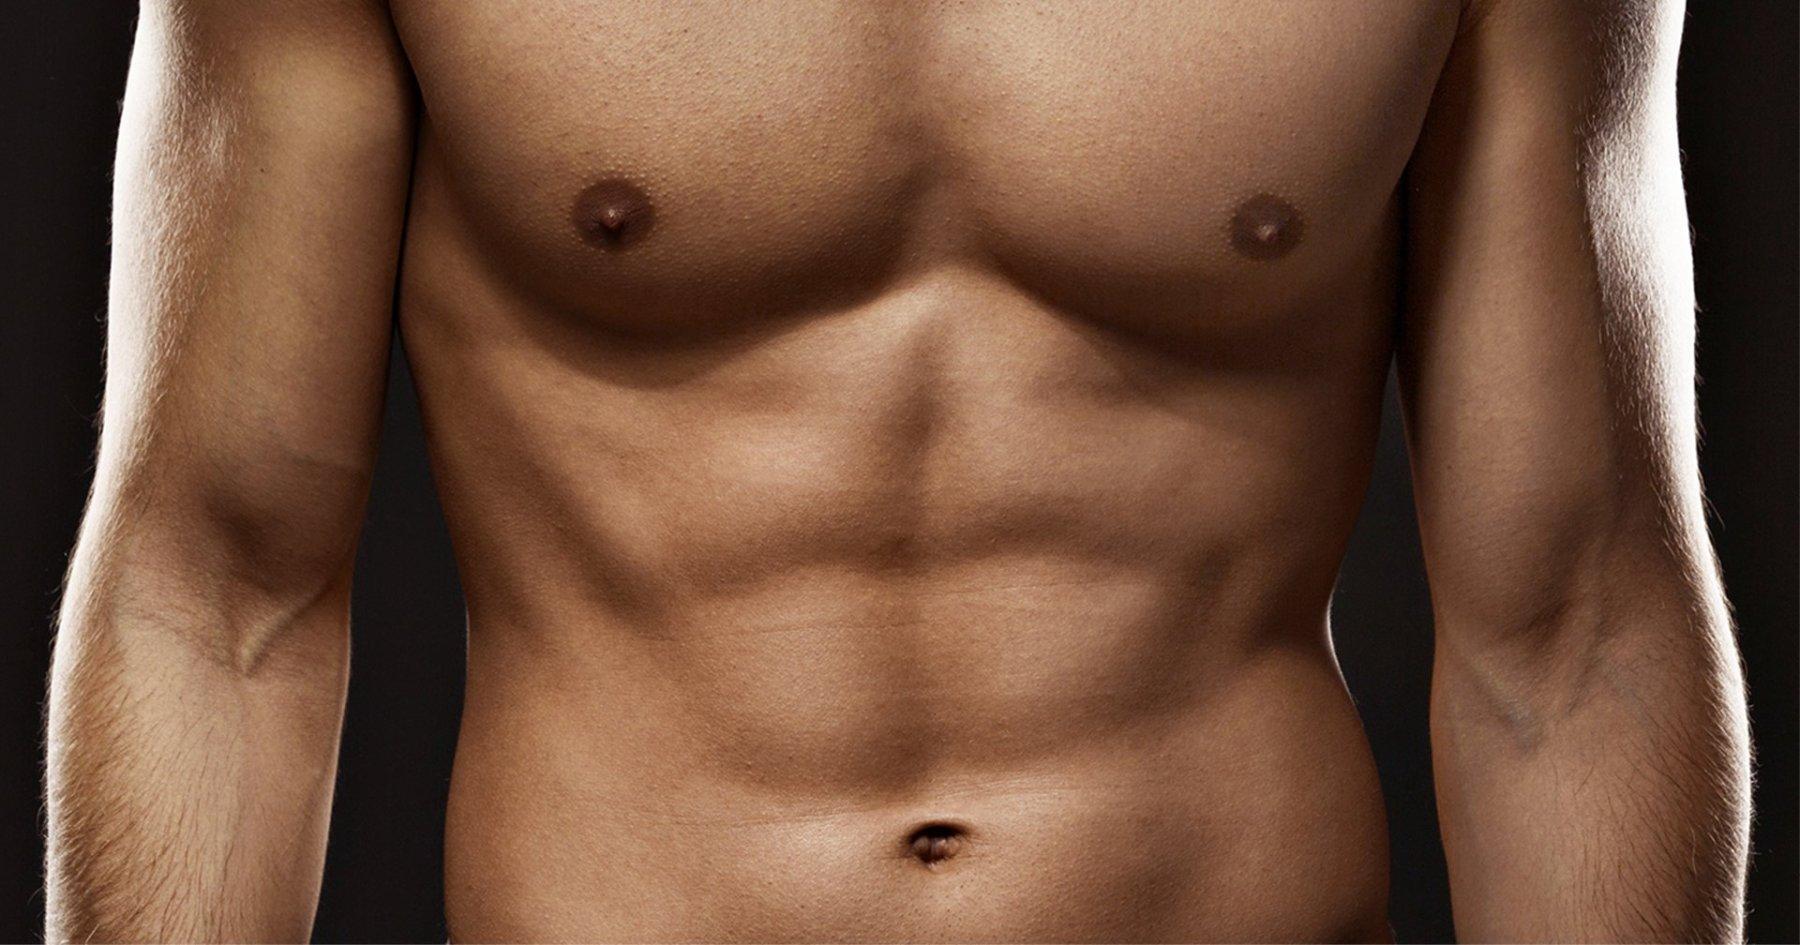 How To Get Rid Of Man Boobs Or Gynecomastia Insidehook